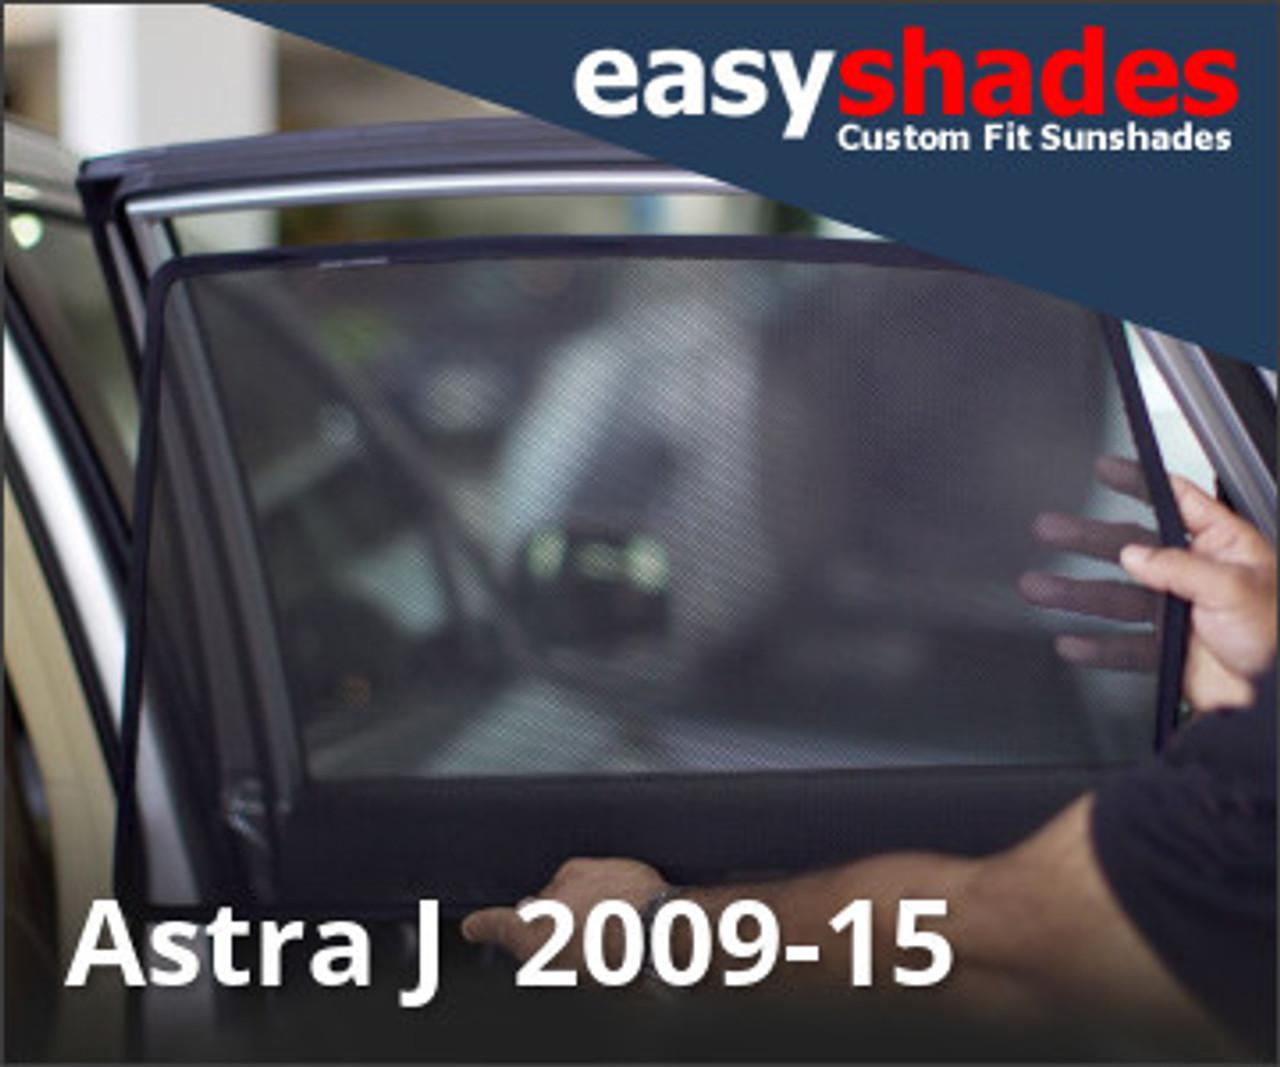 Astra J 2009-15